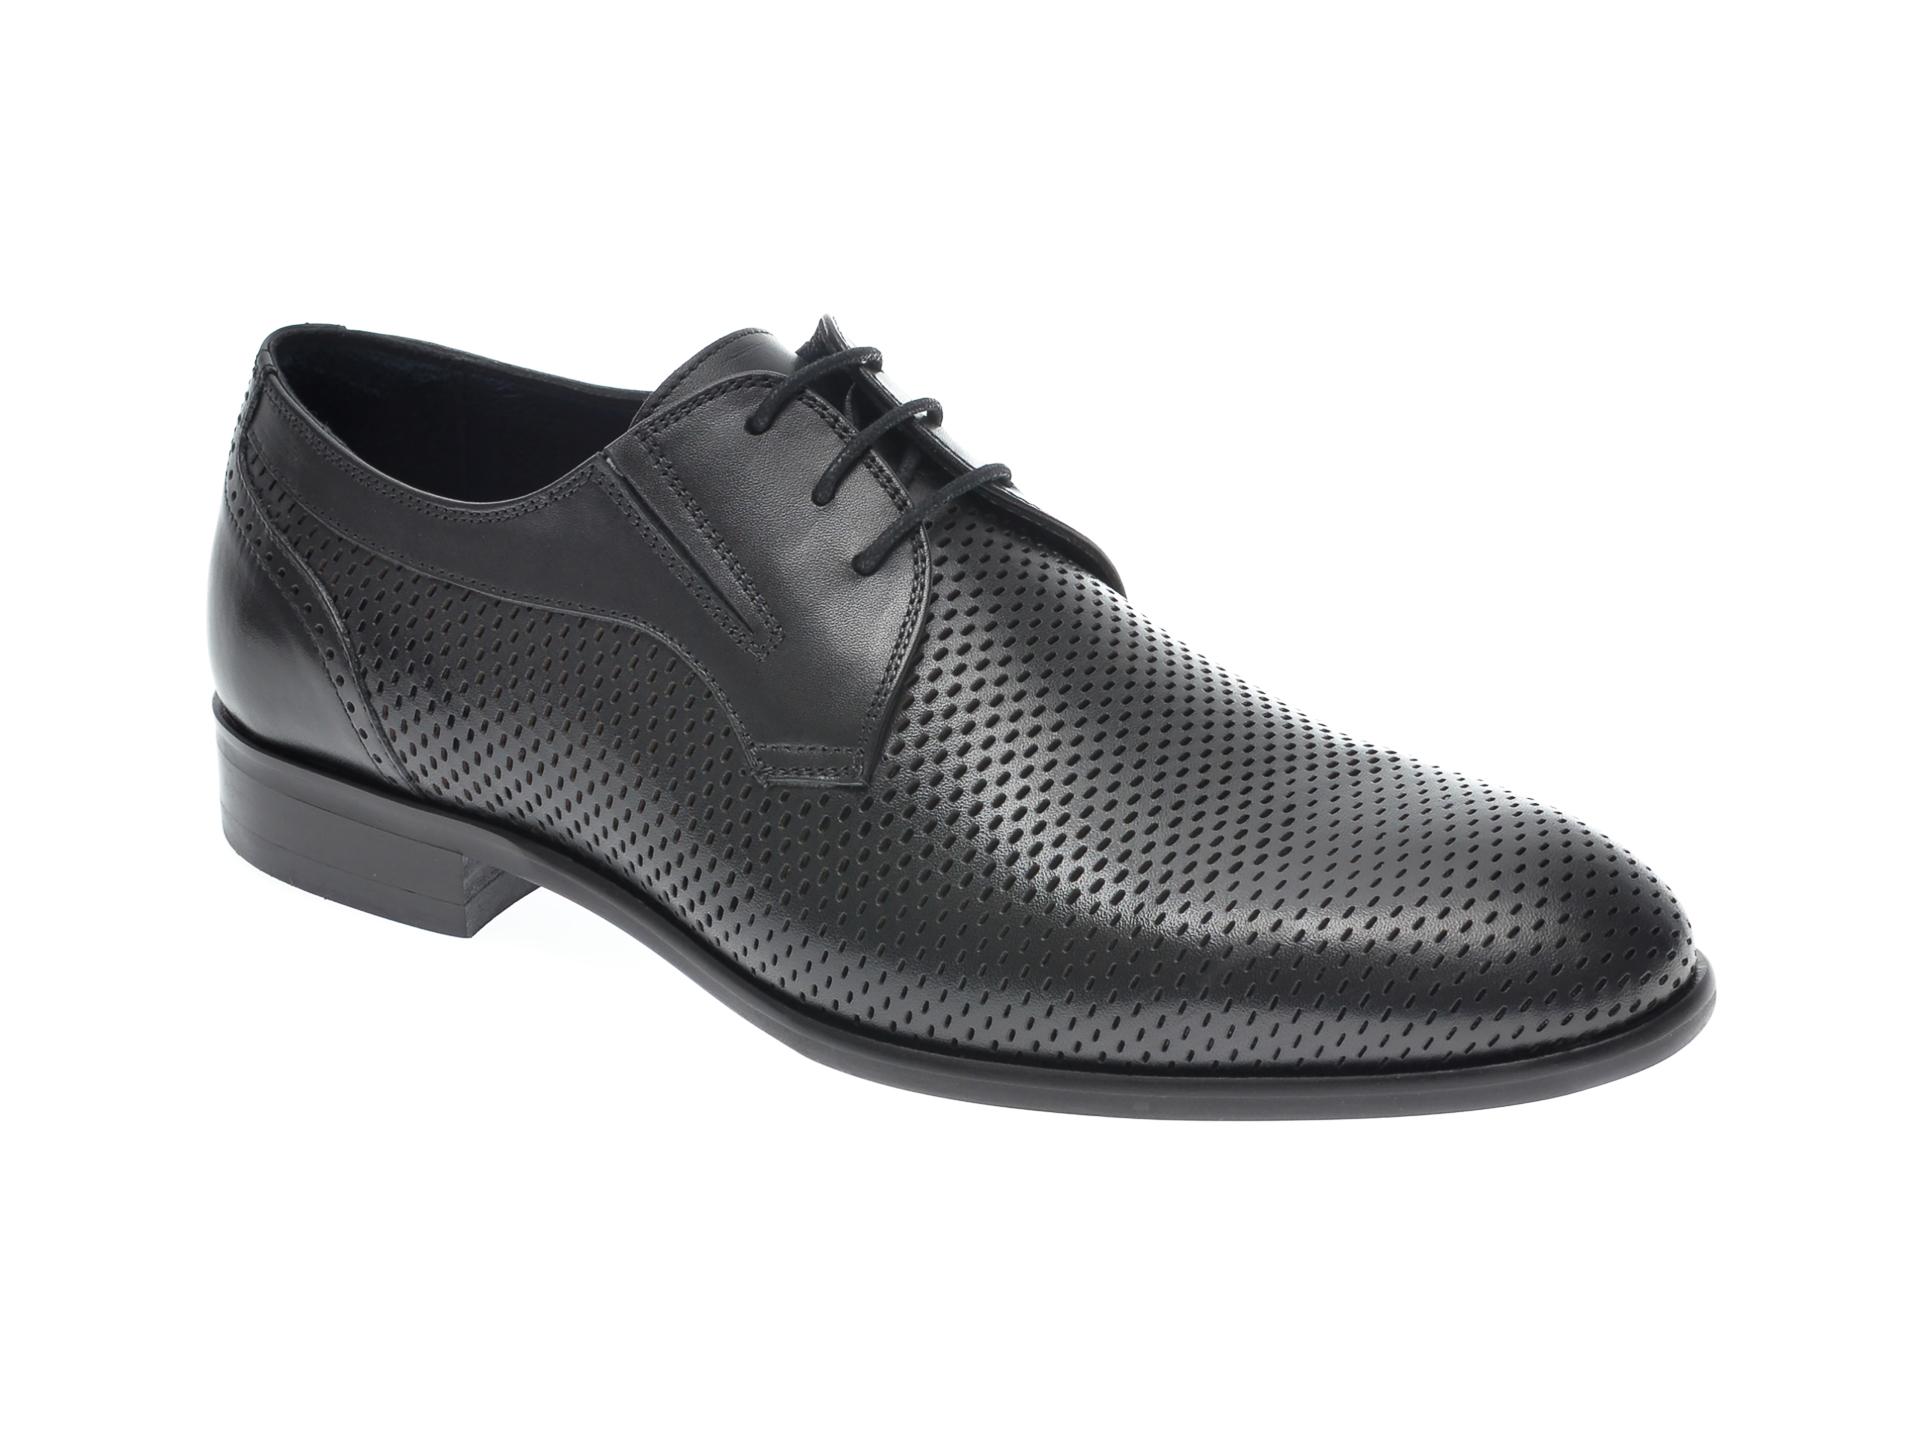 Pantofi OTTER negri, 7838, din piele naturala imagine